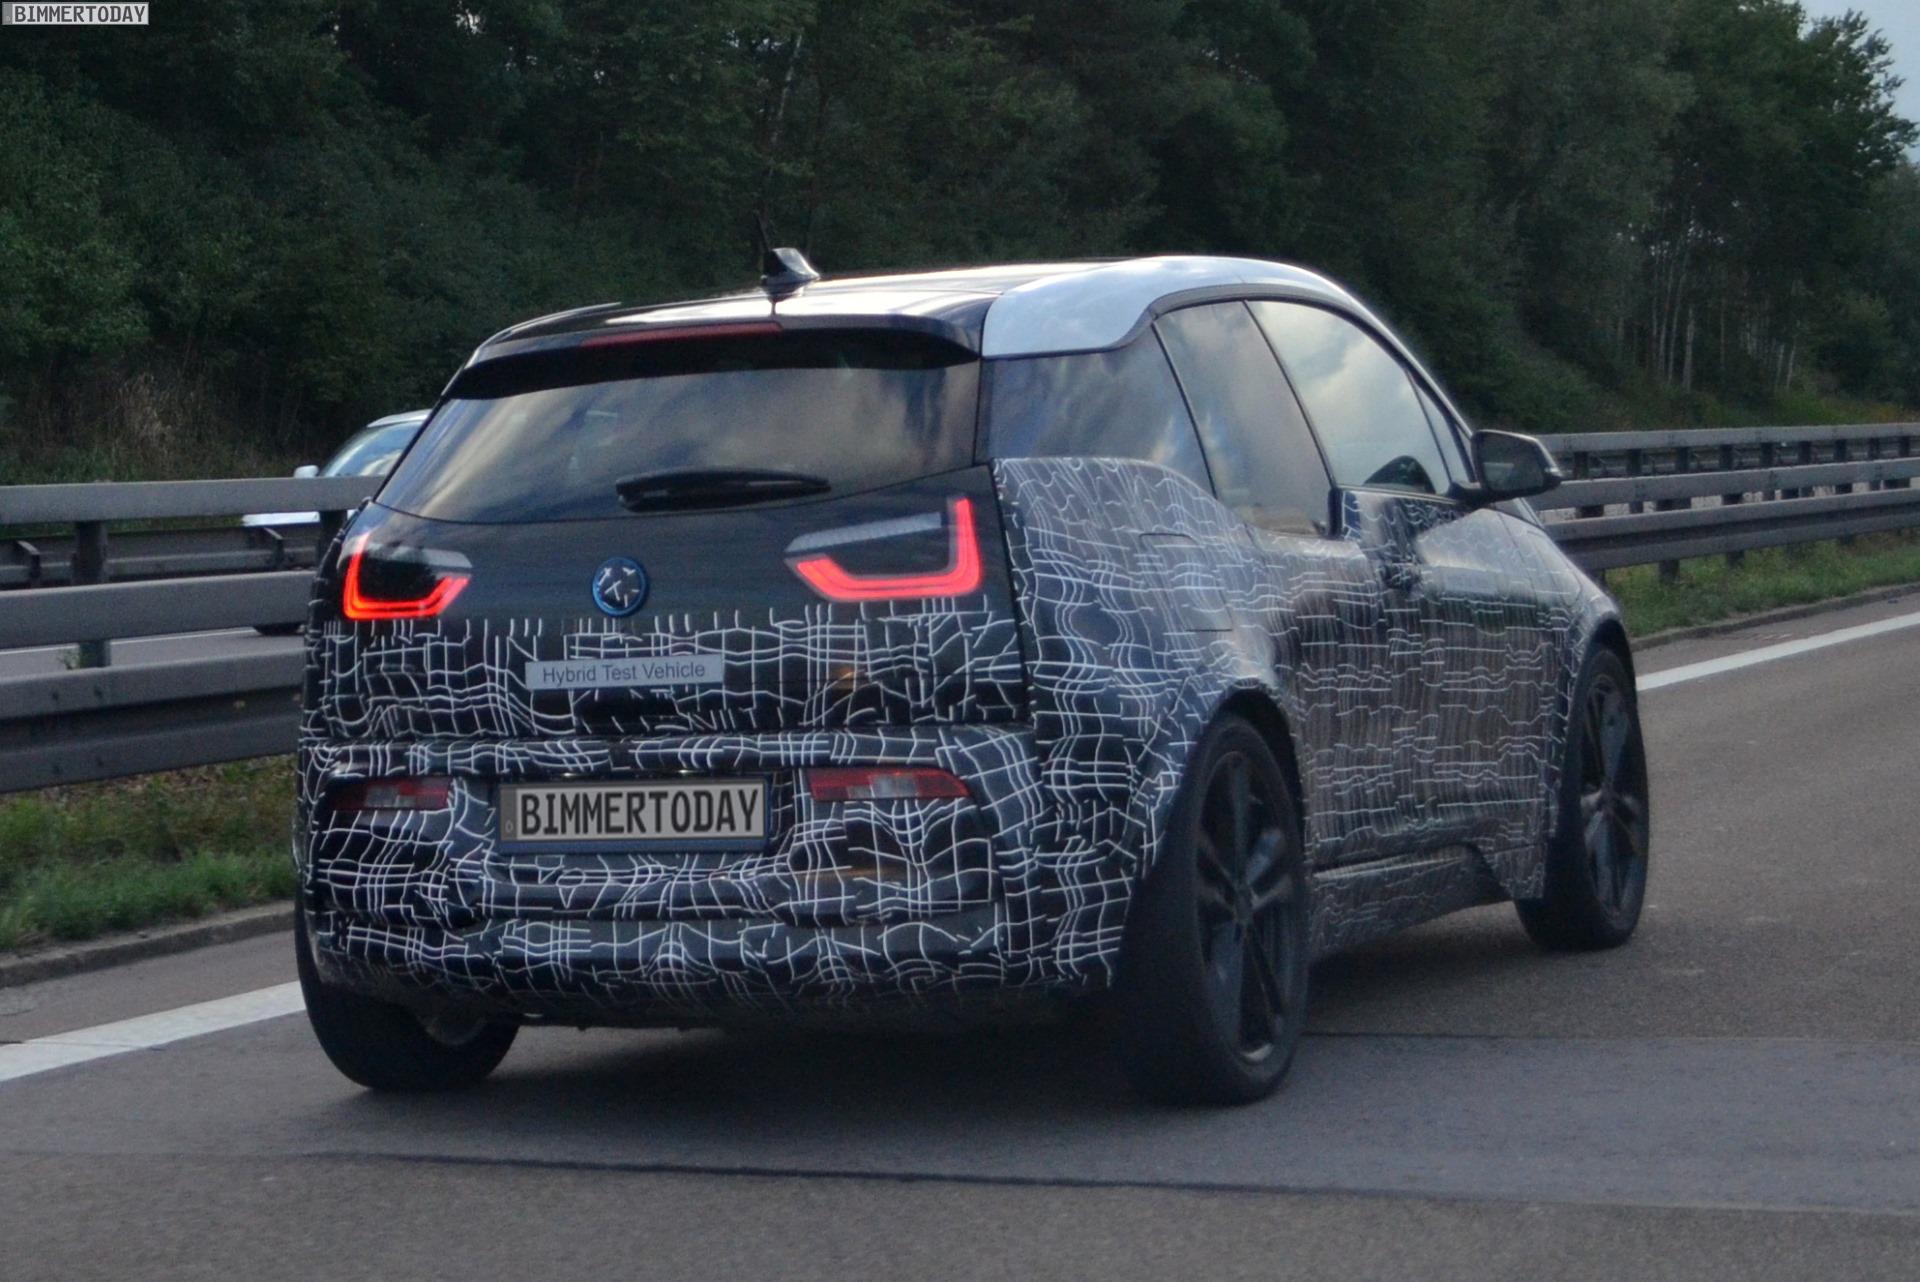 2017 BMW i3 S Facelift I01 LCI Erlkoenig 03